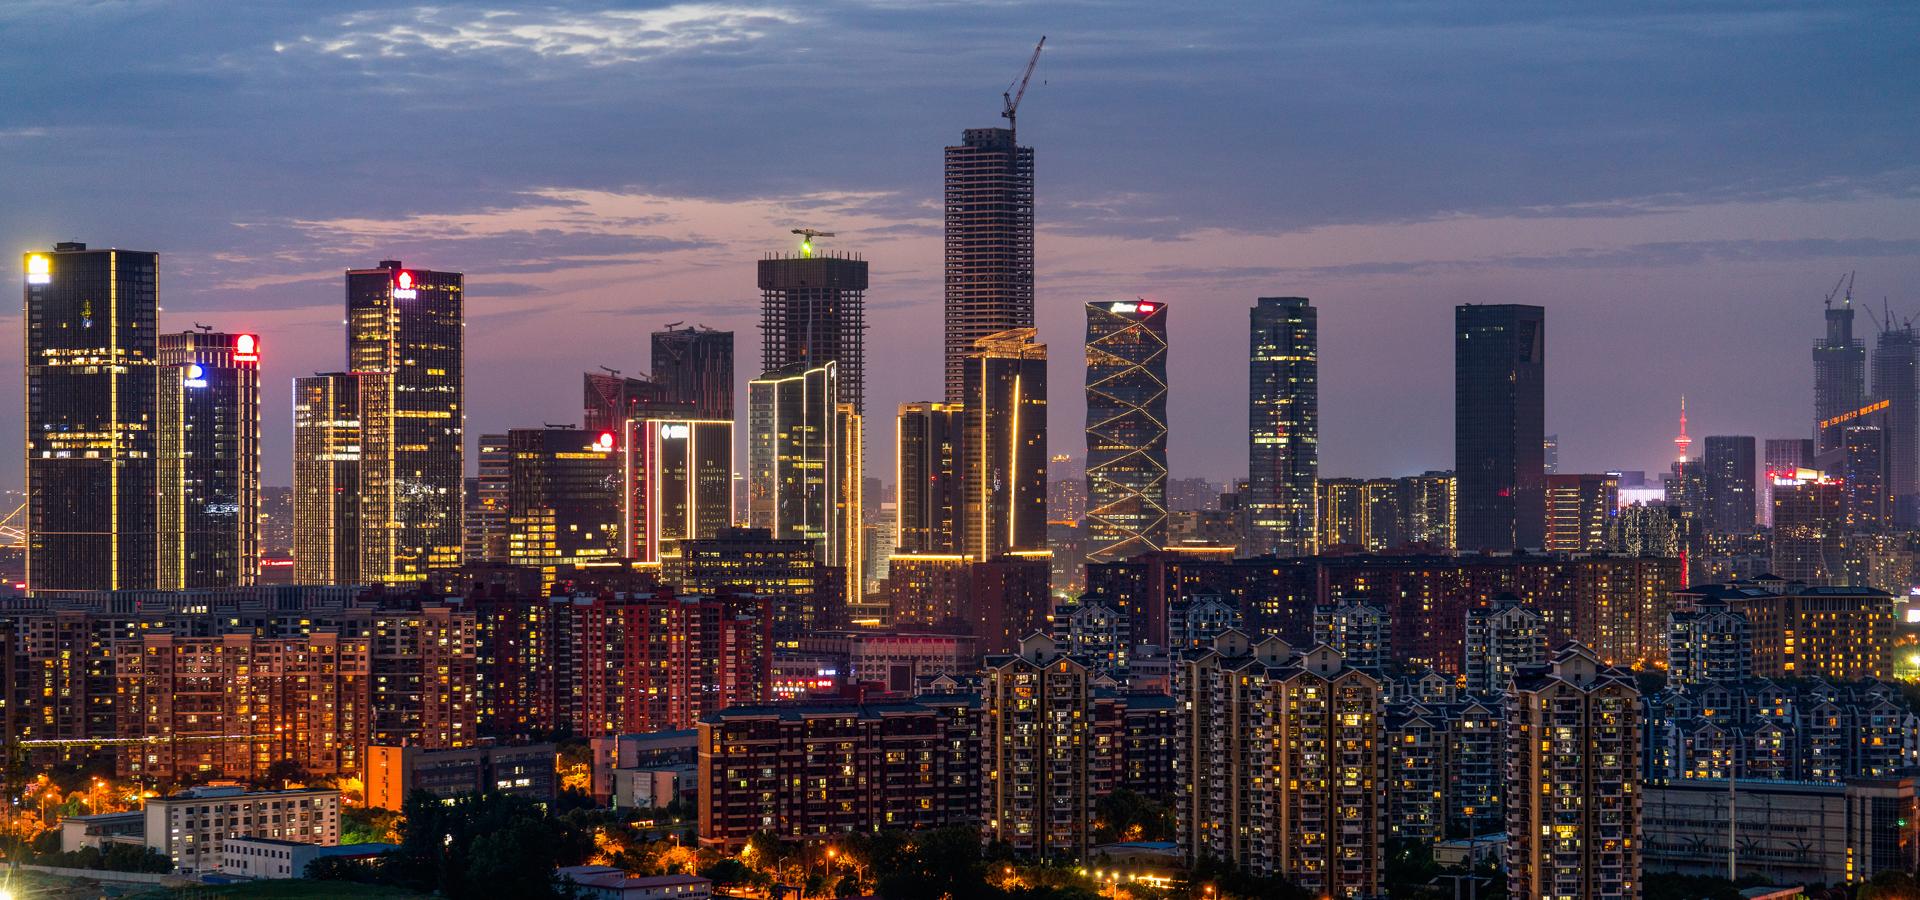 Peer-to-peer advisory in Wuxi, Jiangsu, China